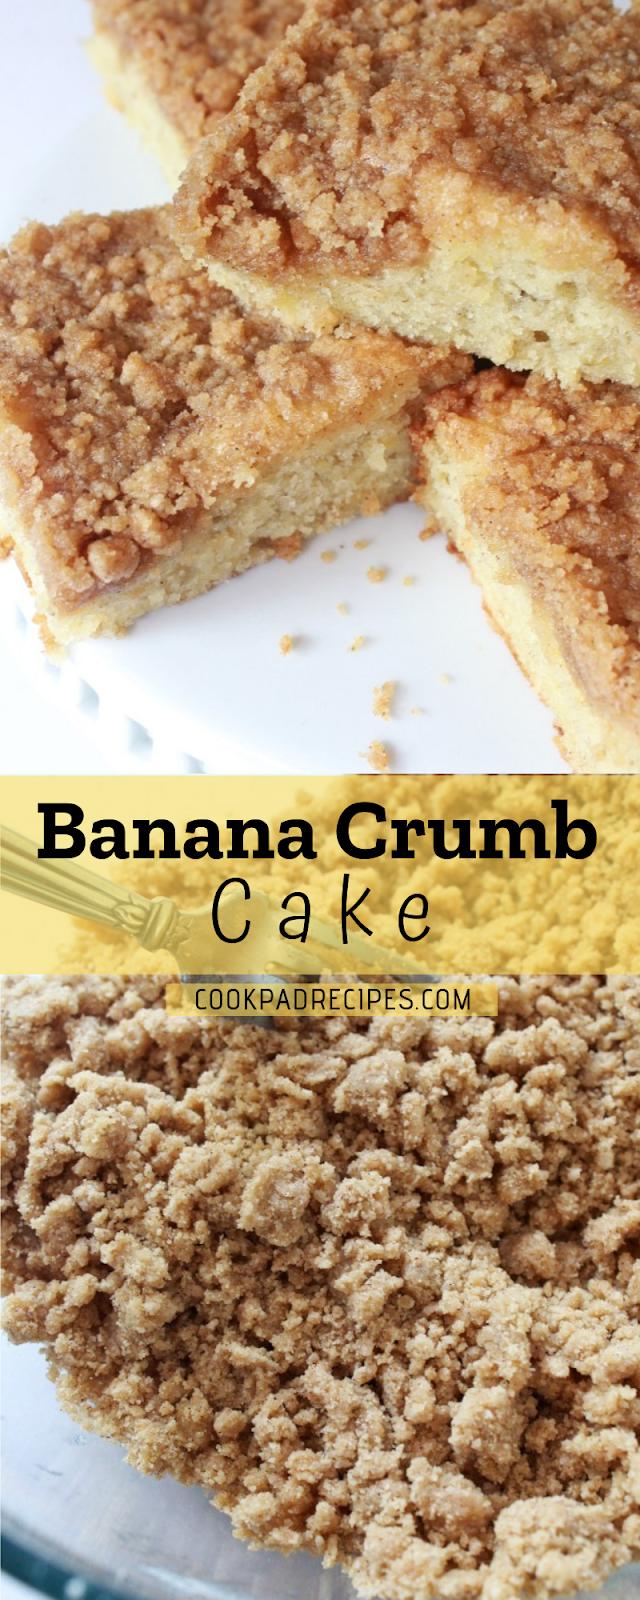 Banana Crumb Cake